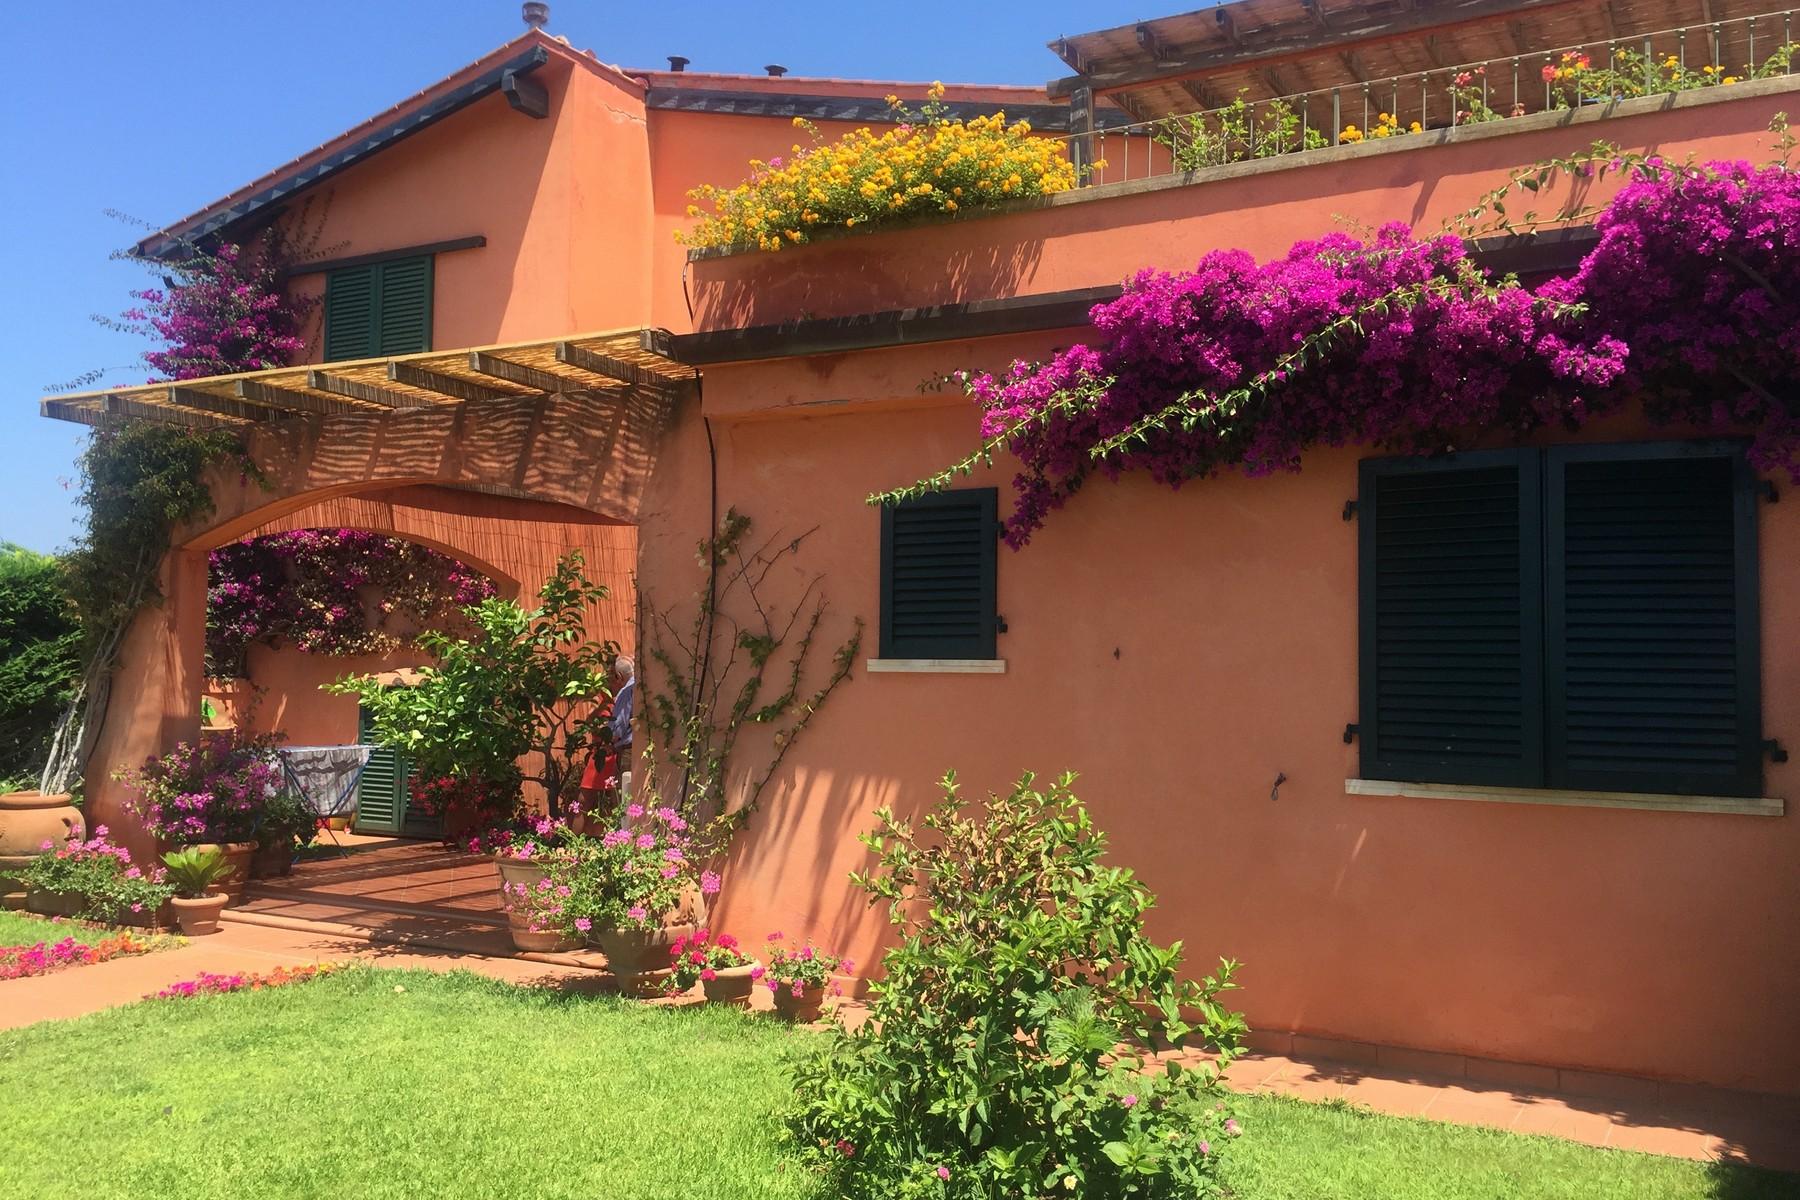 Casa indipendente in Vendita a Capoliveri: 5 locali, 190 mq - Foto 6